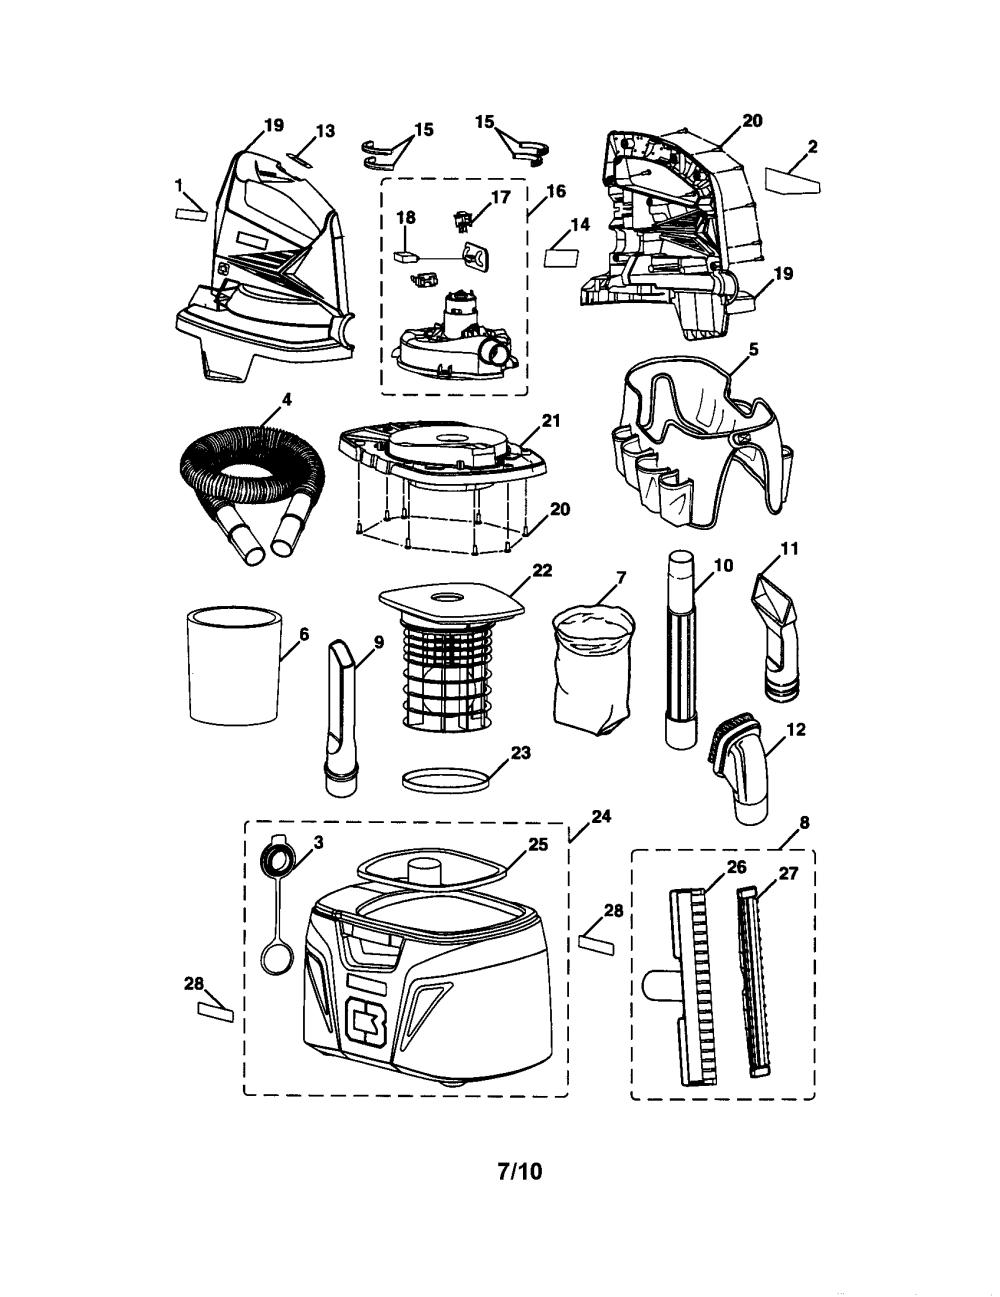 medium resolution of craftsman 315175980 shop vac diagram